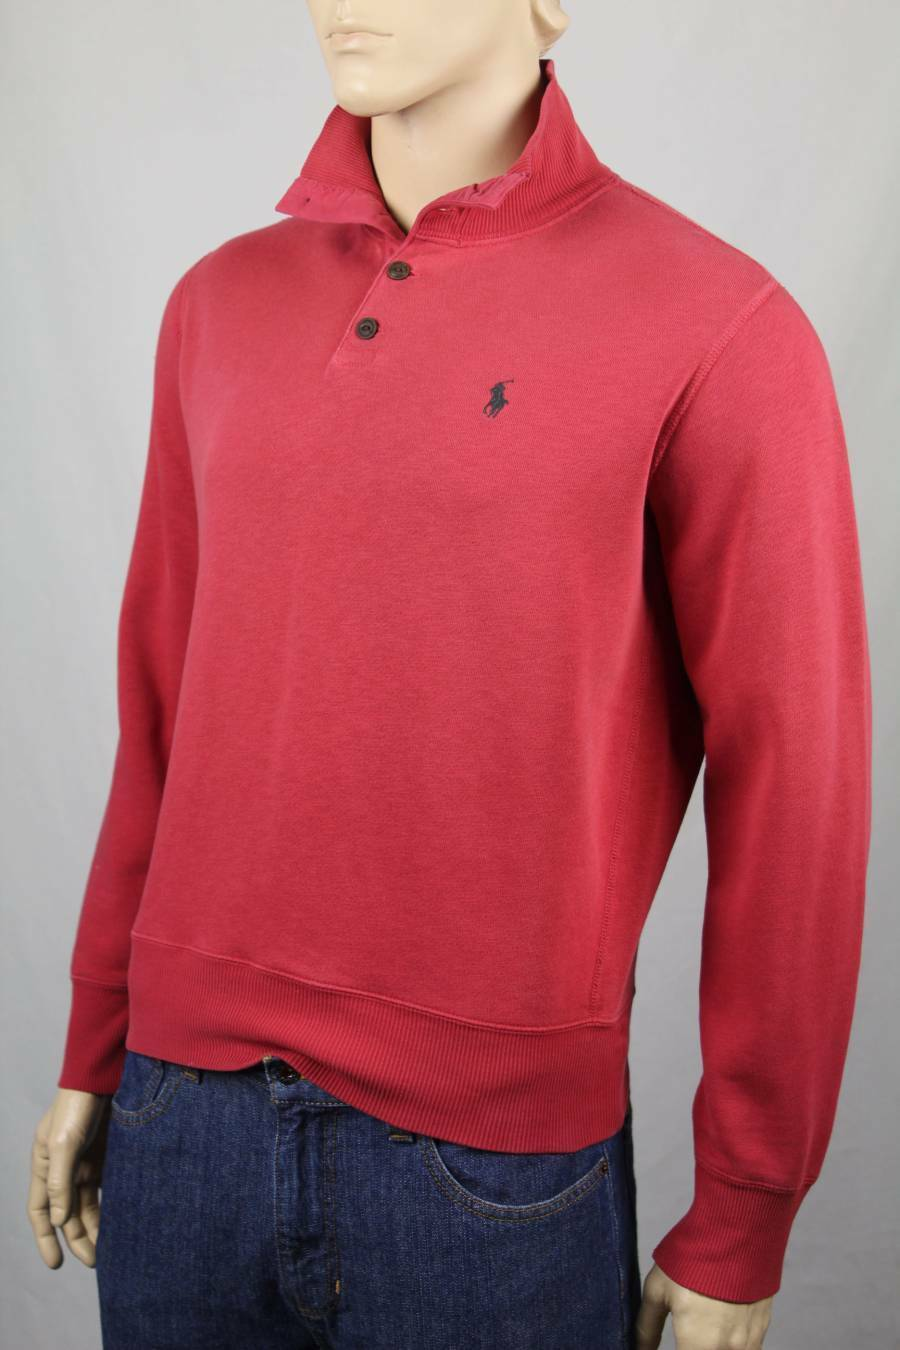 Polo Ralph Lauren ROT 1/2 Half Button Sweater Grün Blau Pony NWT